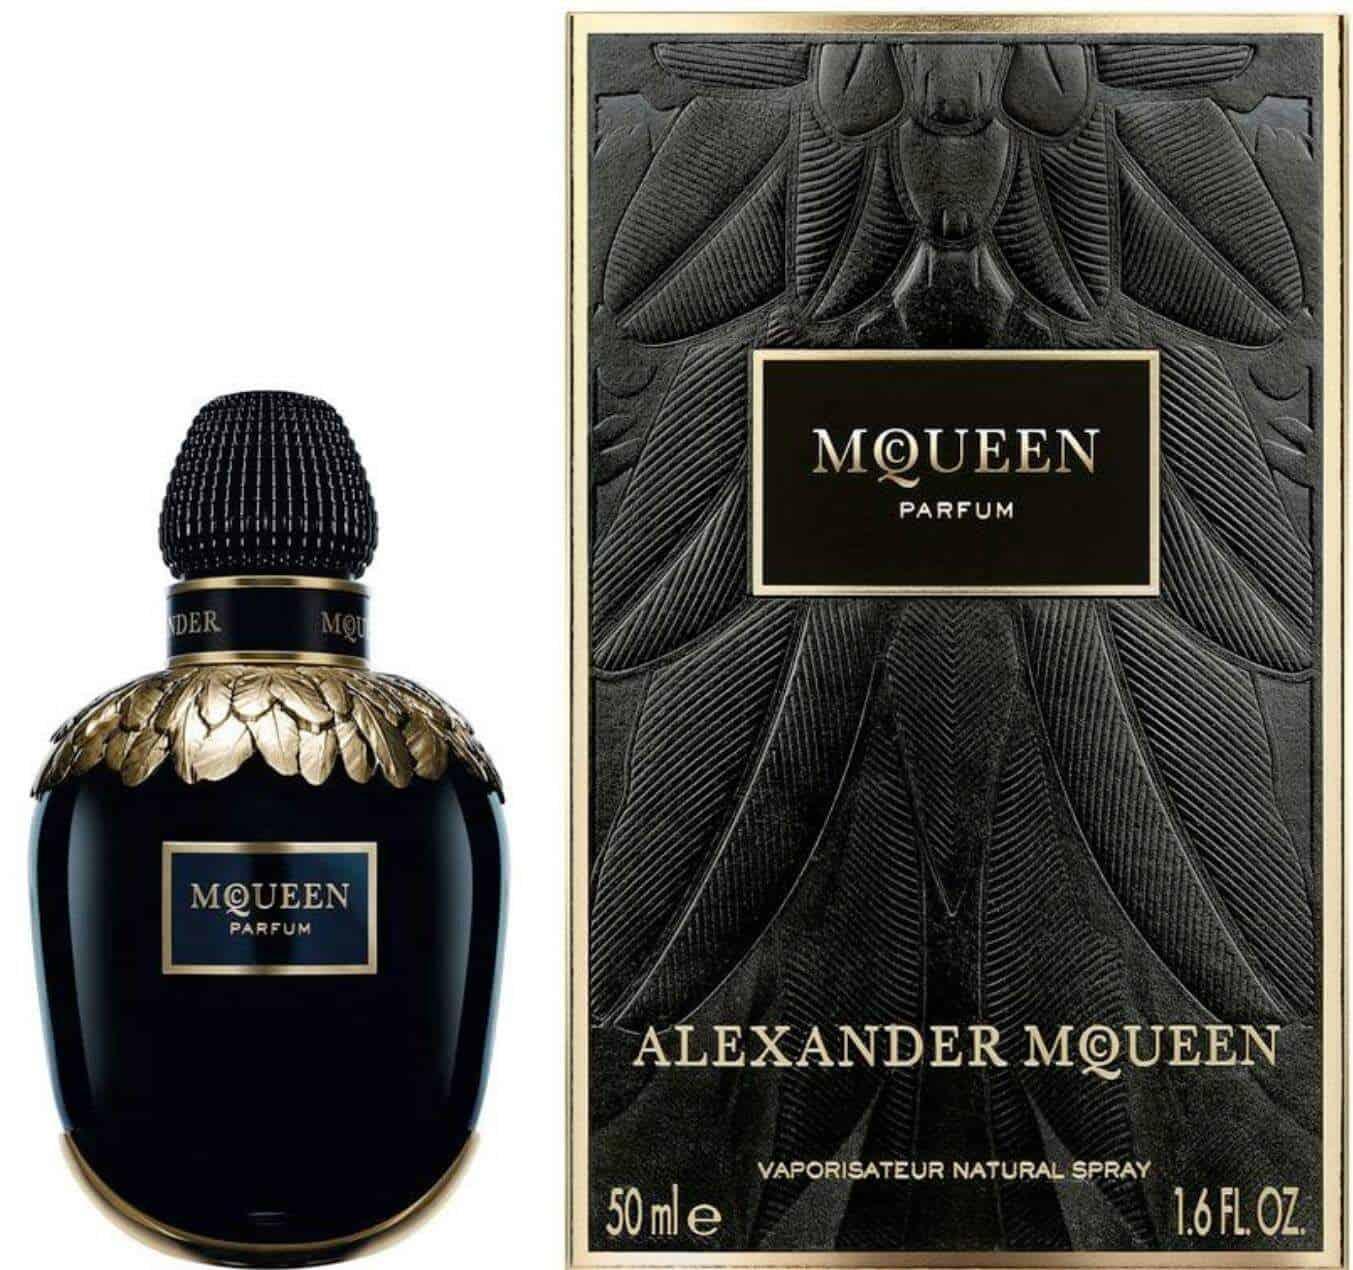 عطر McQueen Parfum